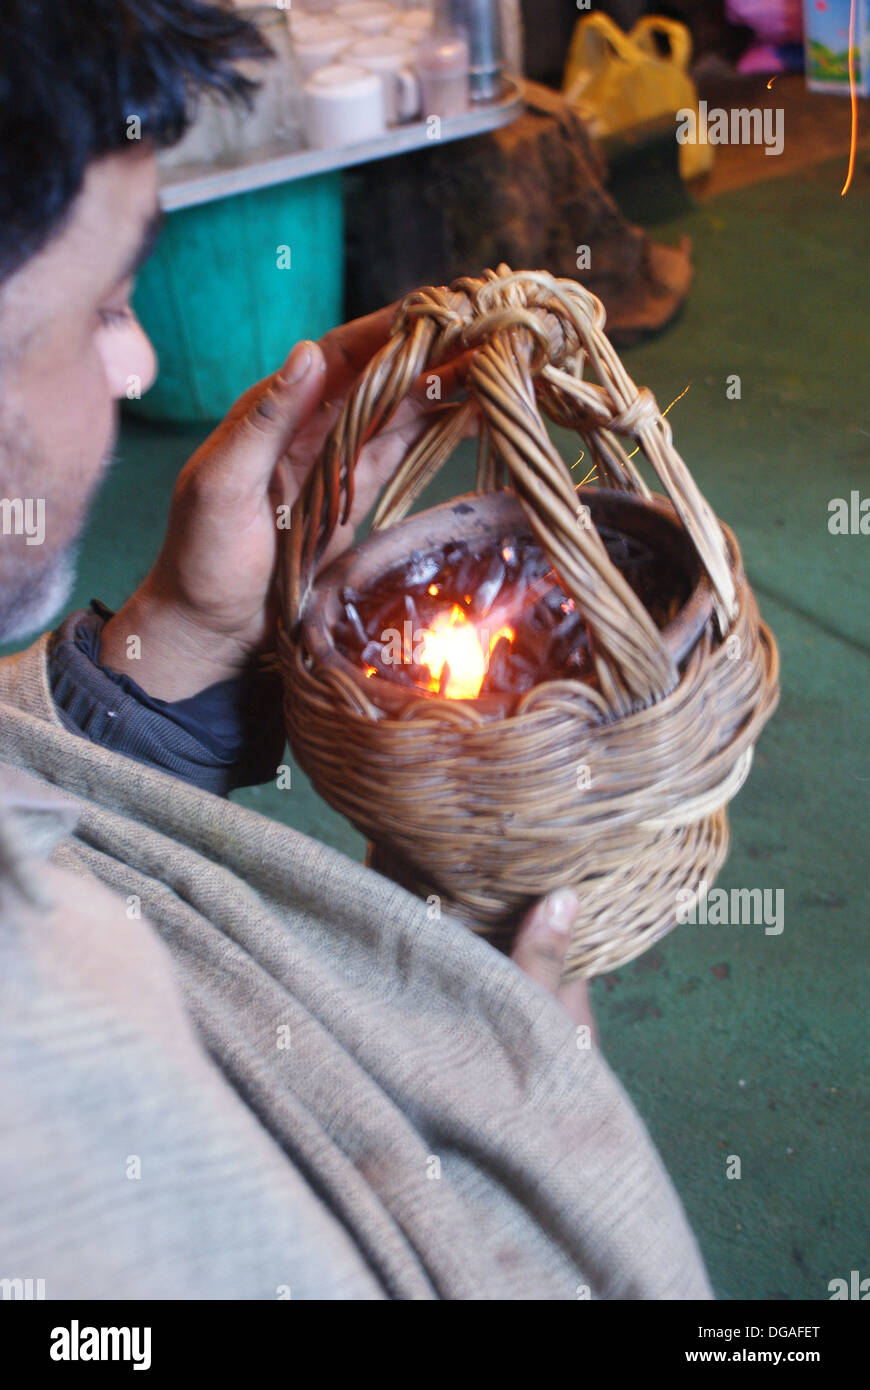 Lighting A Kanger In Pahalgam Kashmir India